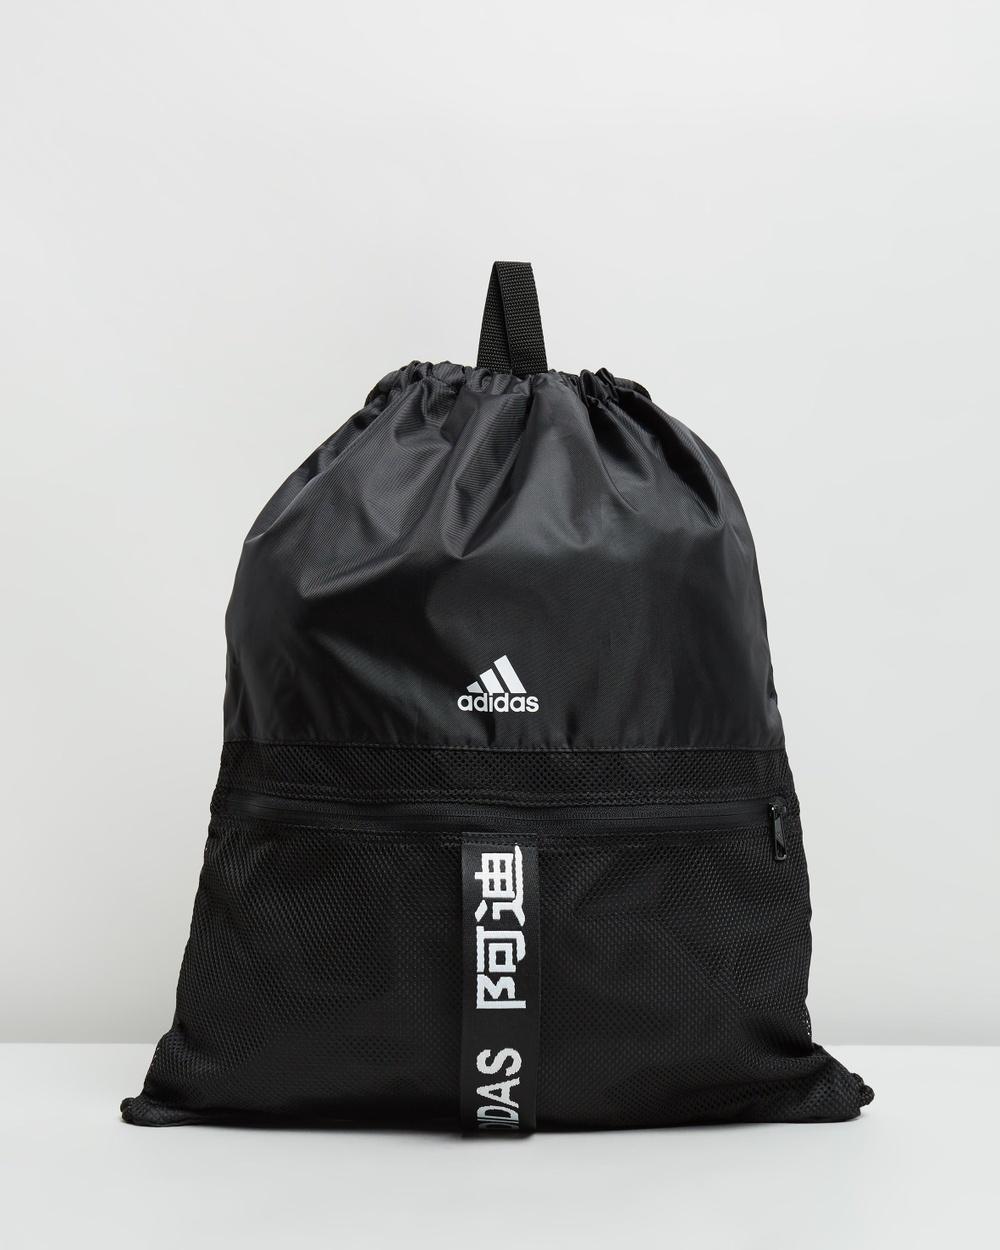 adidas Performance 4ATHLTS Gym Bag Backpacks Black & White